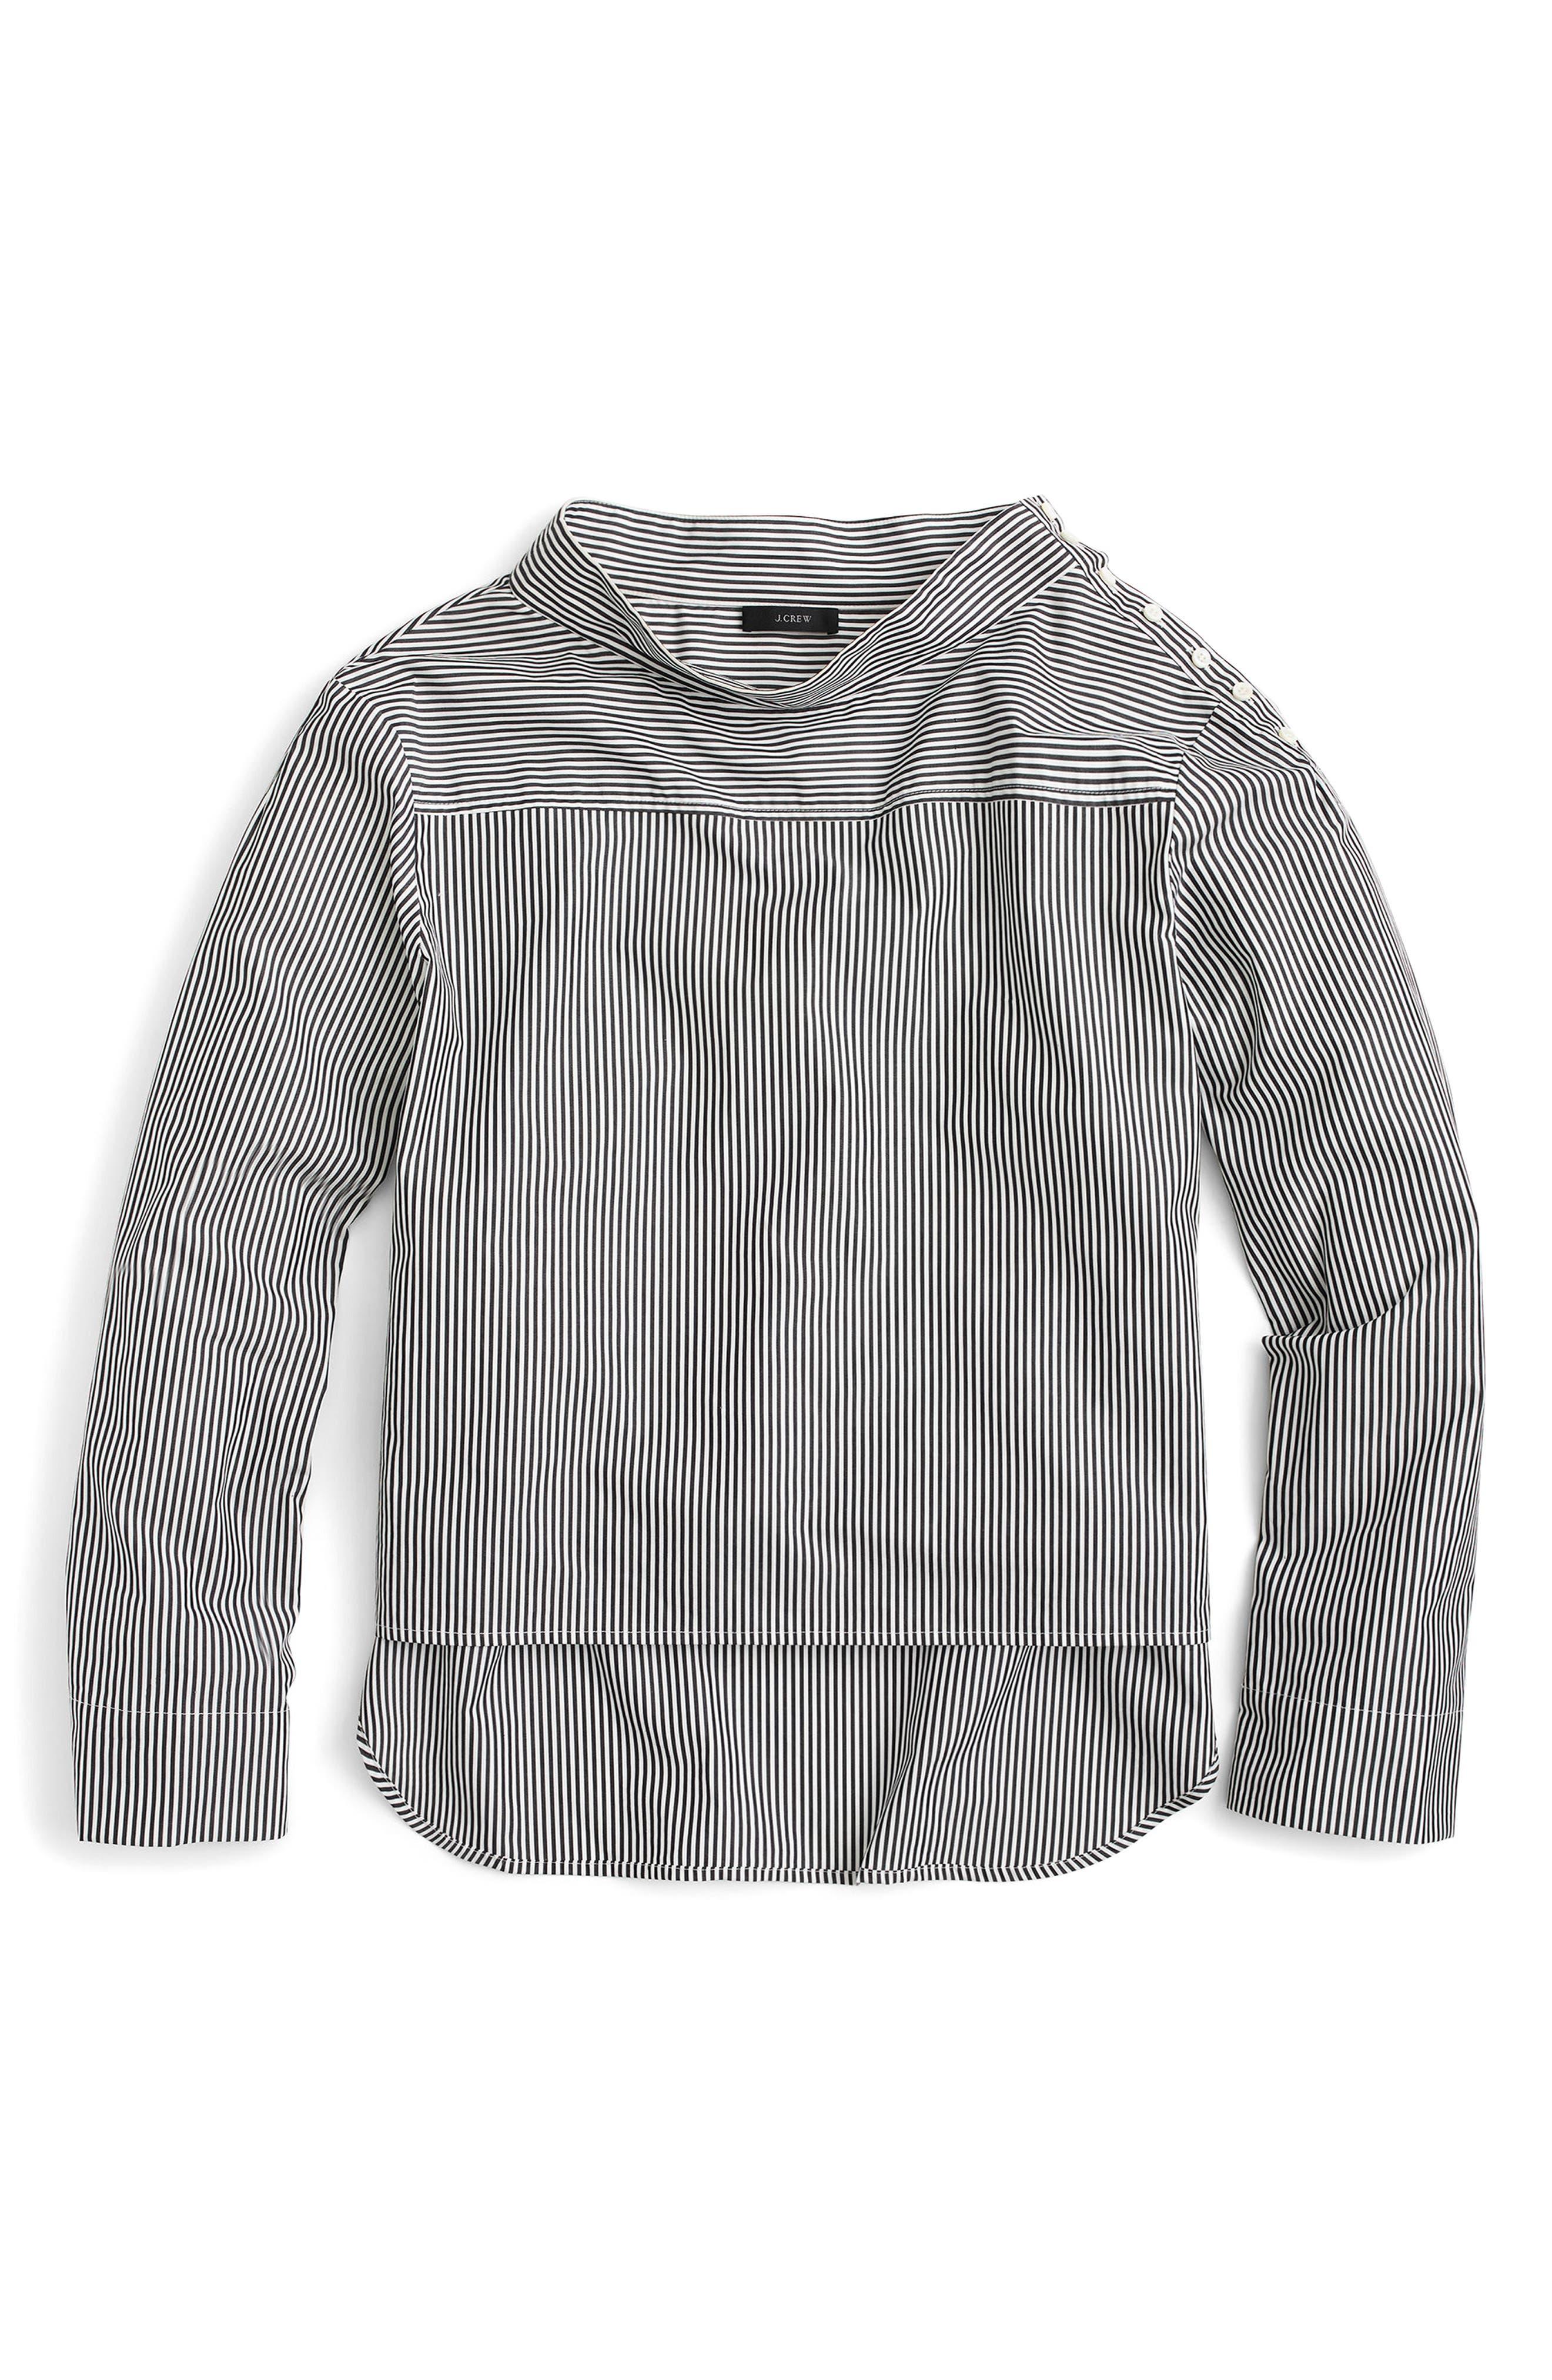 Main Image - J.Crew Funnel Neck Stripe Shirt (Regular & Petite)